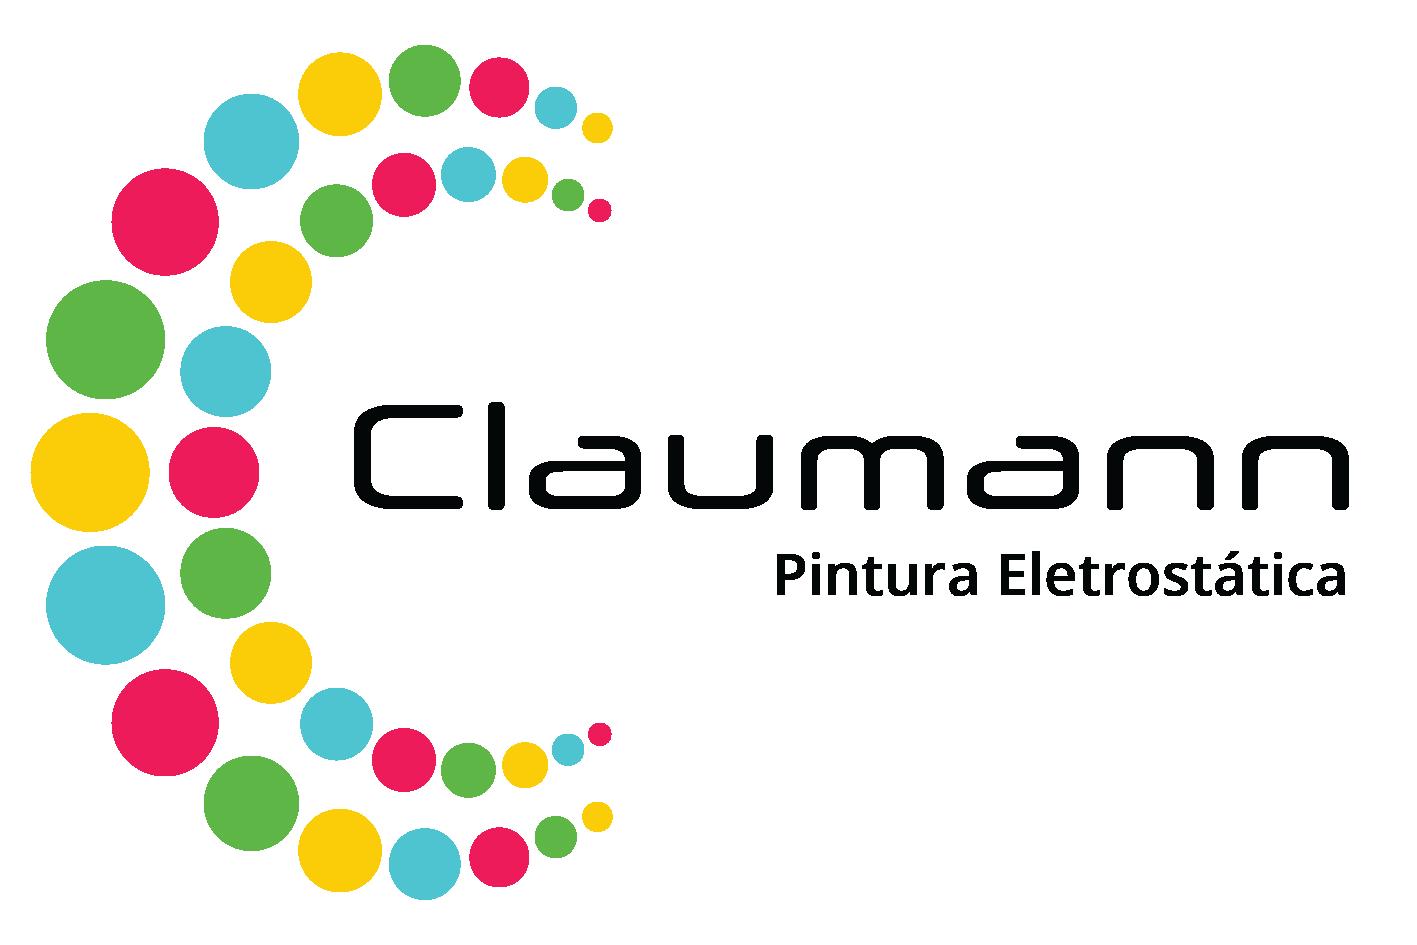 Claumann Pintura Eletrostática